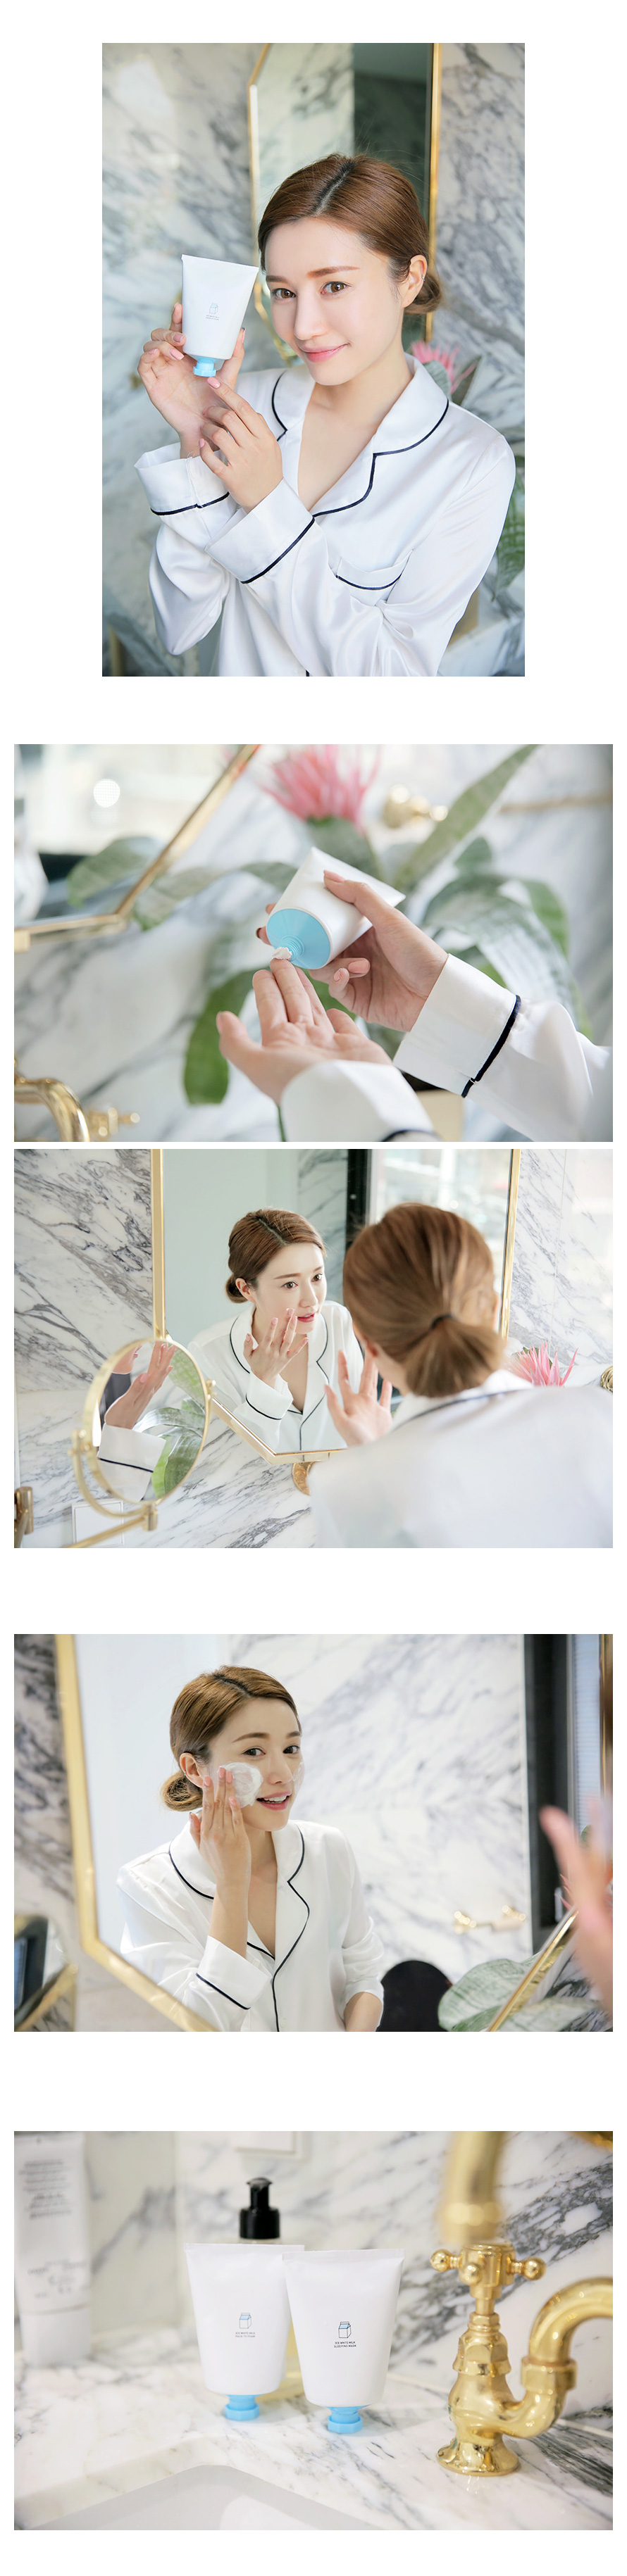 [3CE]ホワイト ミルク パック トゥ フォーム